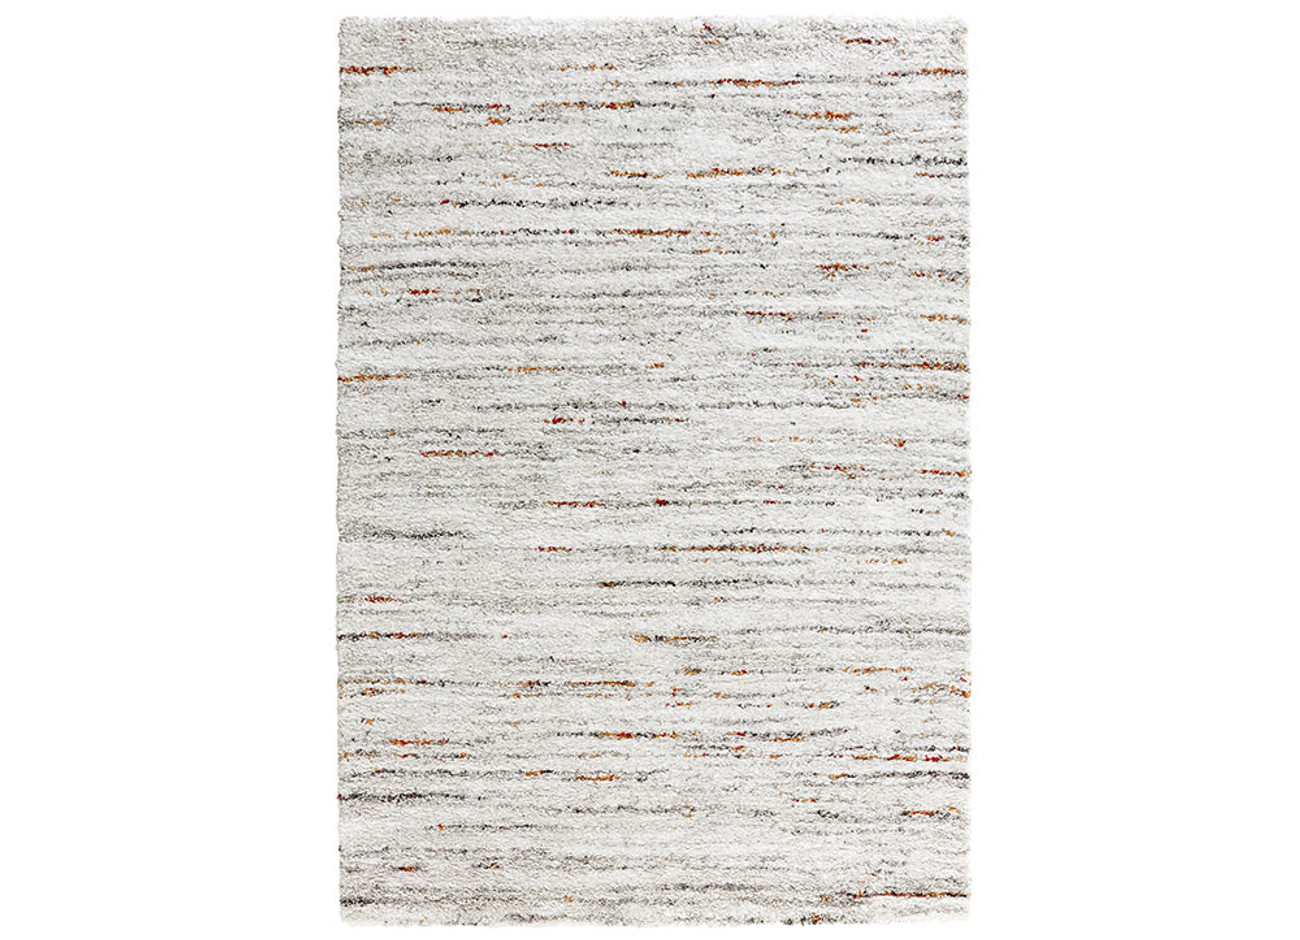 Design-Teppich-Hochflor-Chic-creme-grau-meliert--3 21 Awesome Bougari Outdoor Teppich